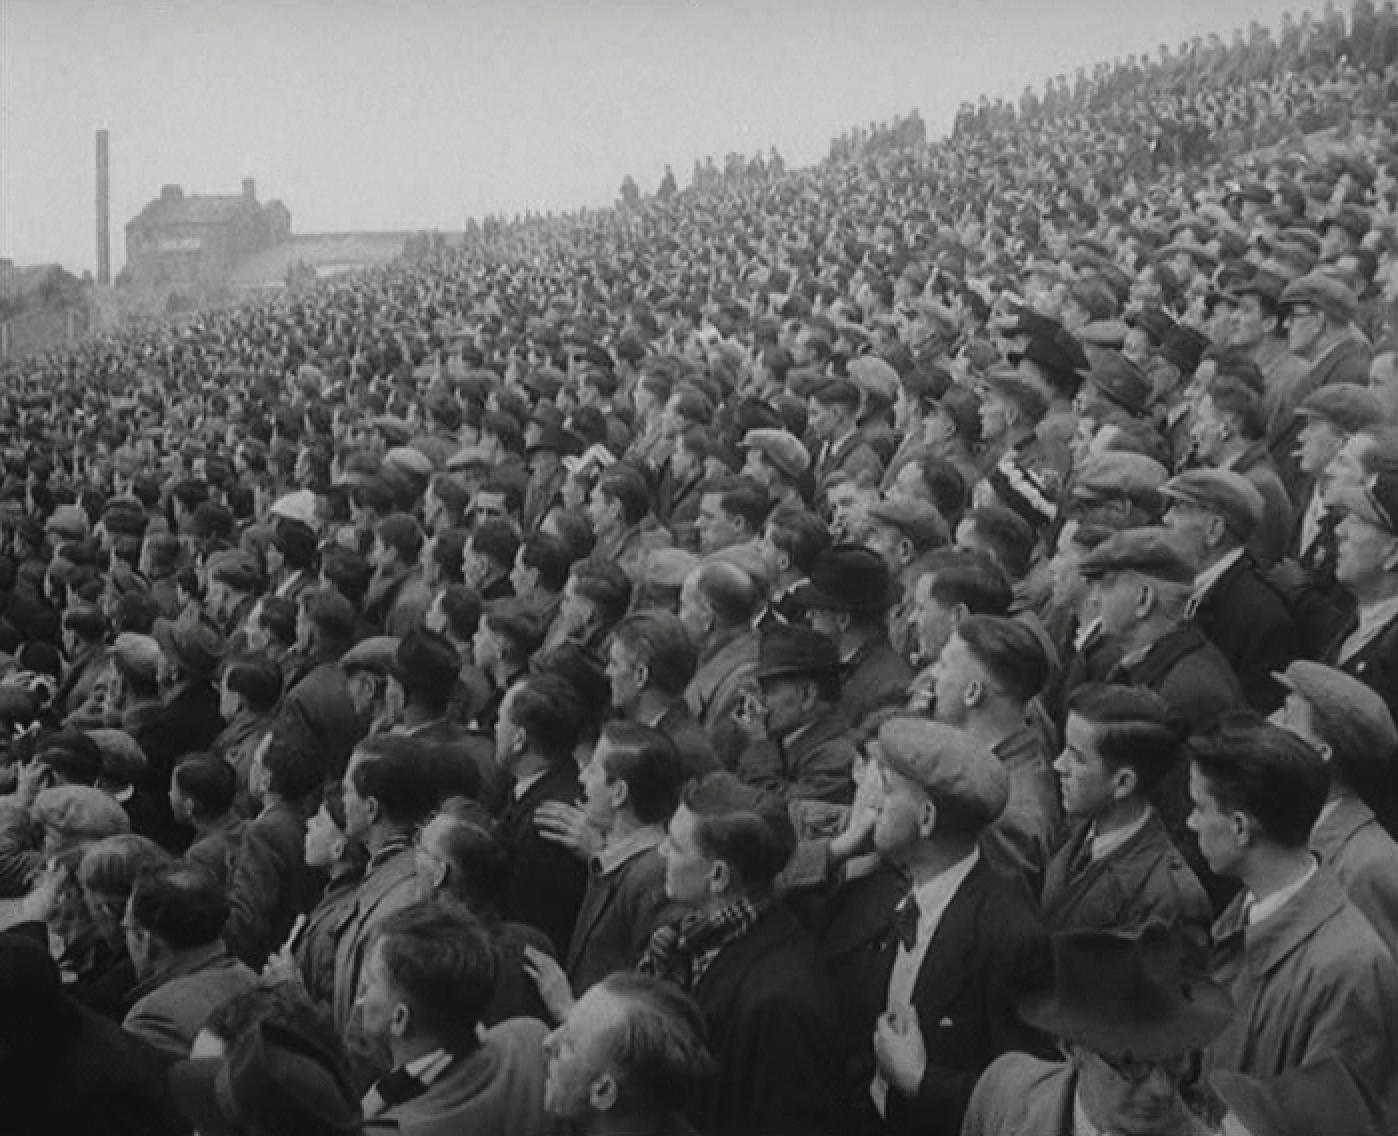 Suited fans watch Swansea vs NorthBank - circa 1950s